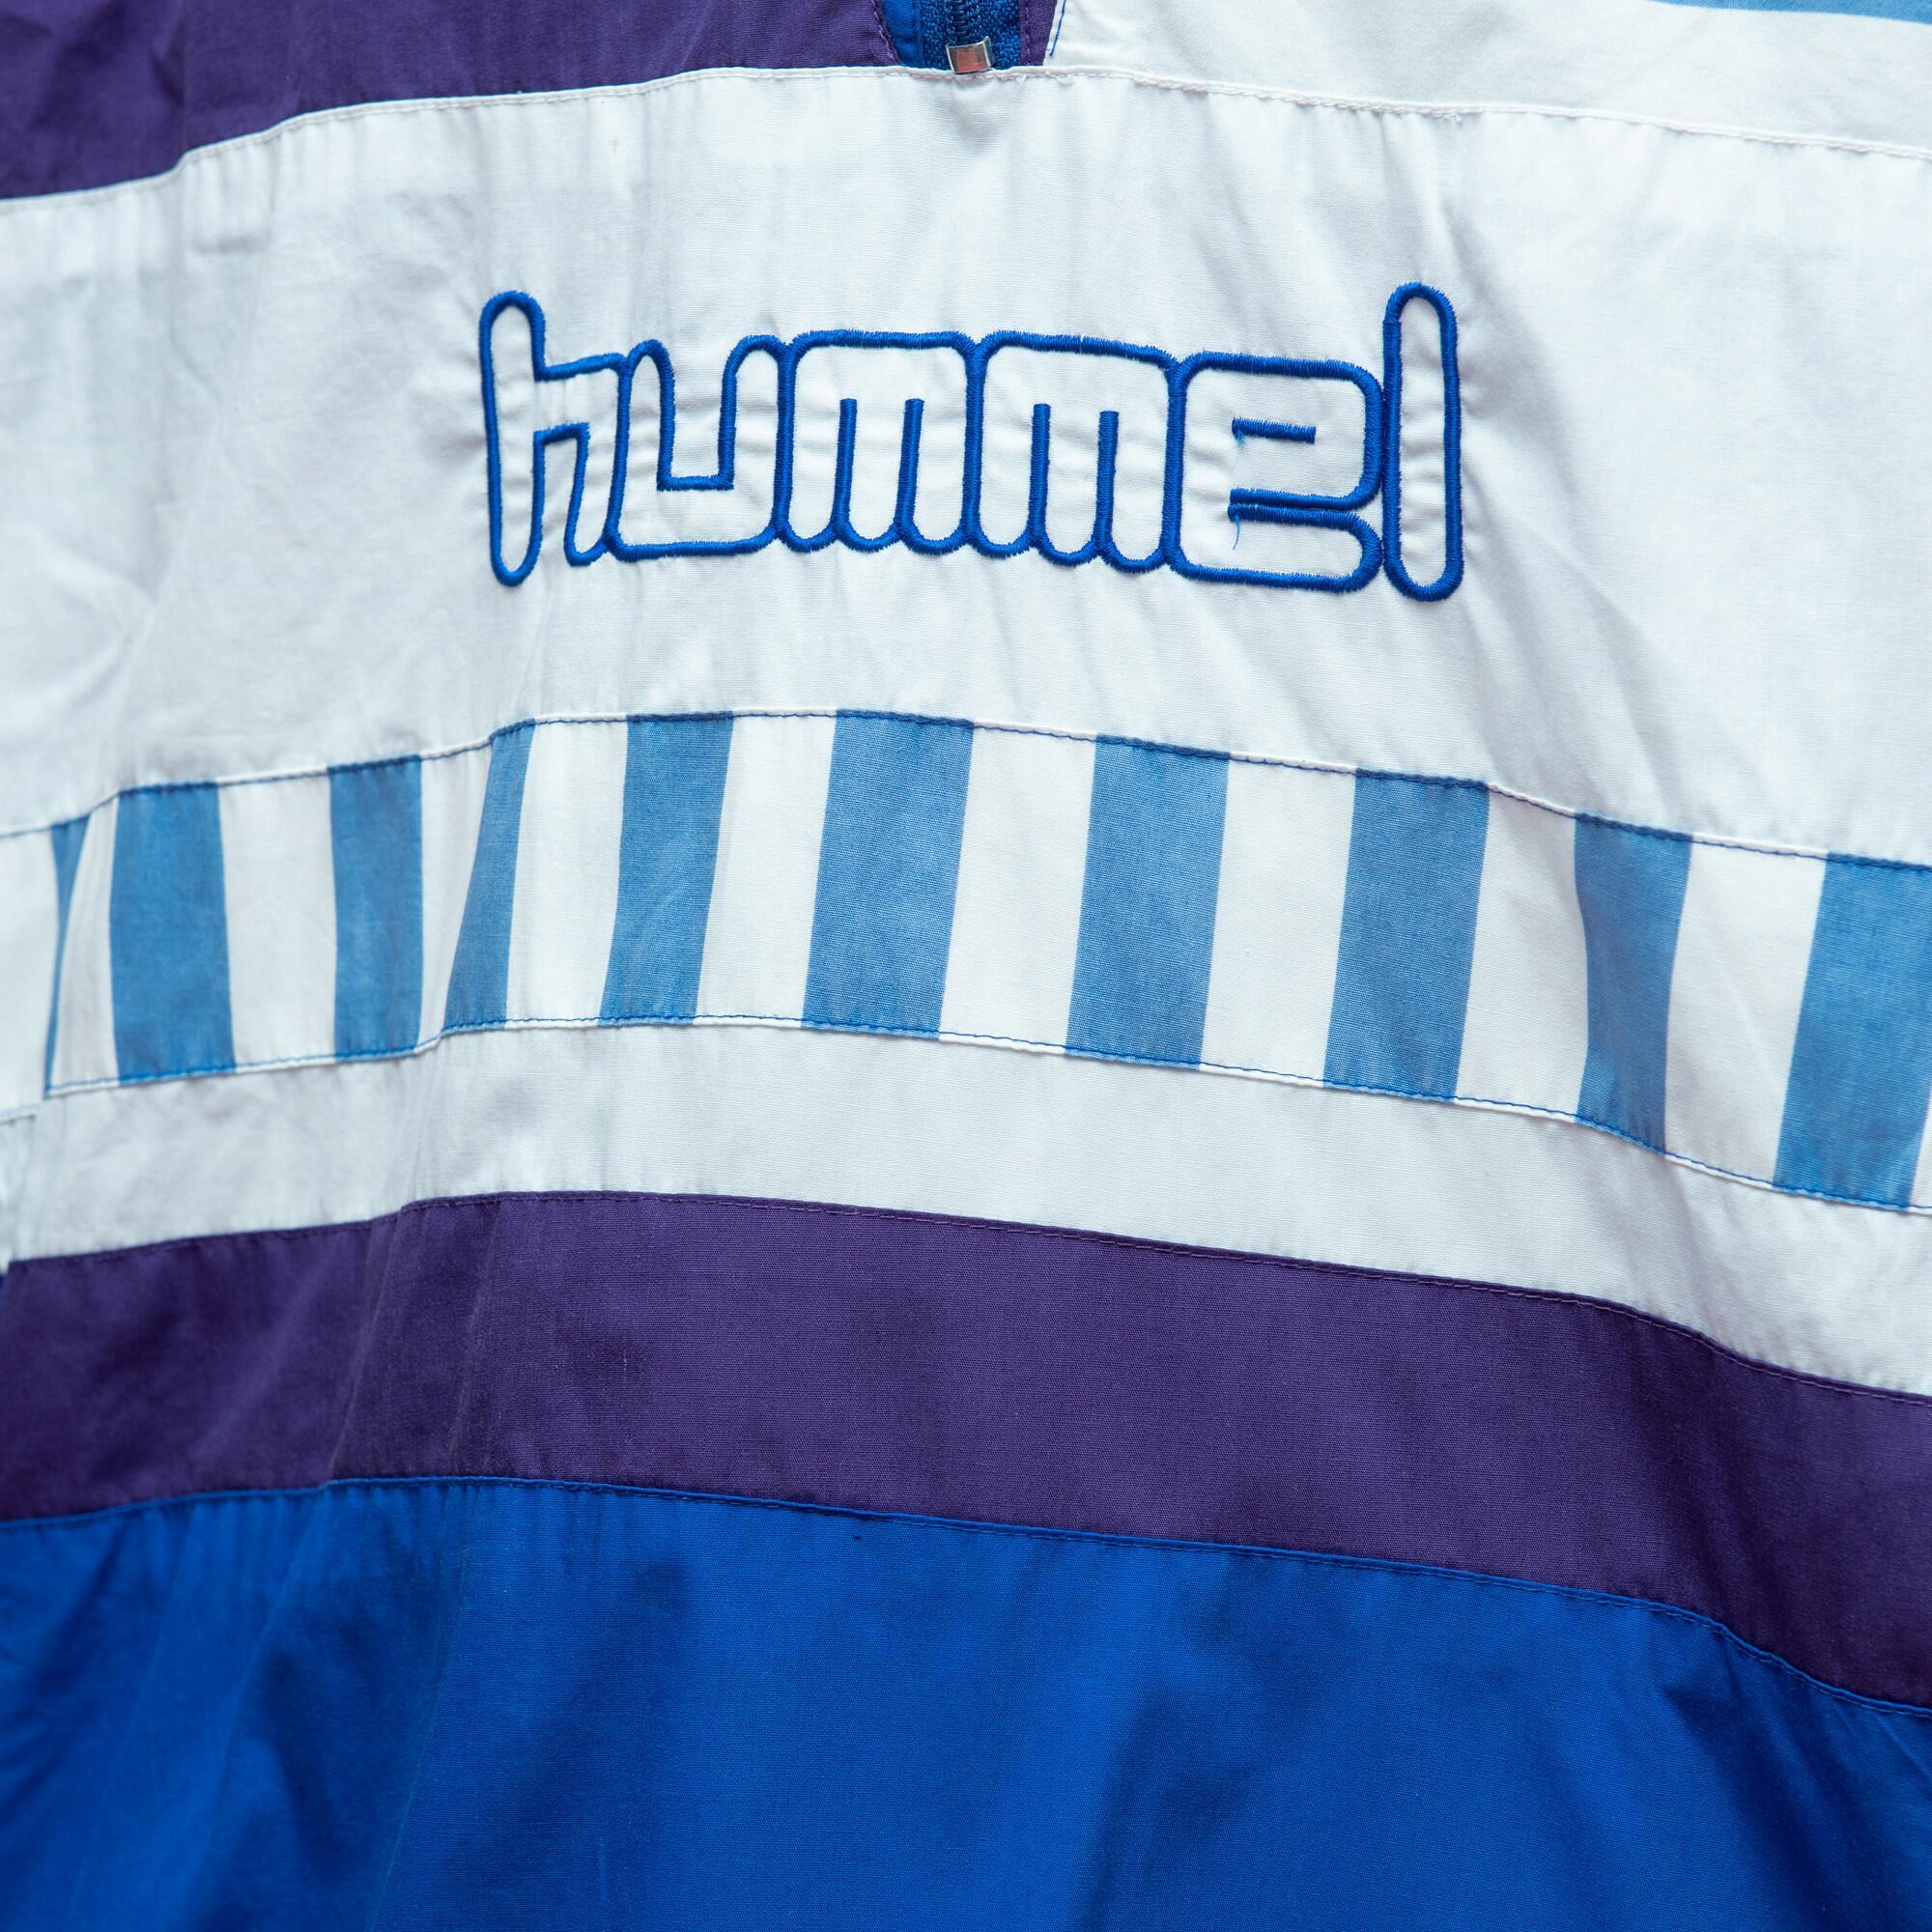 Niebieska bluza marki Hummel - KEX Vintage Store | JestemSlow.pl